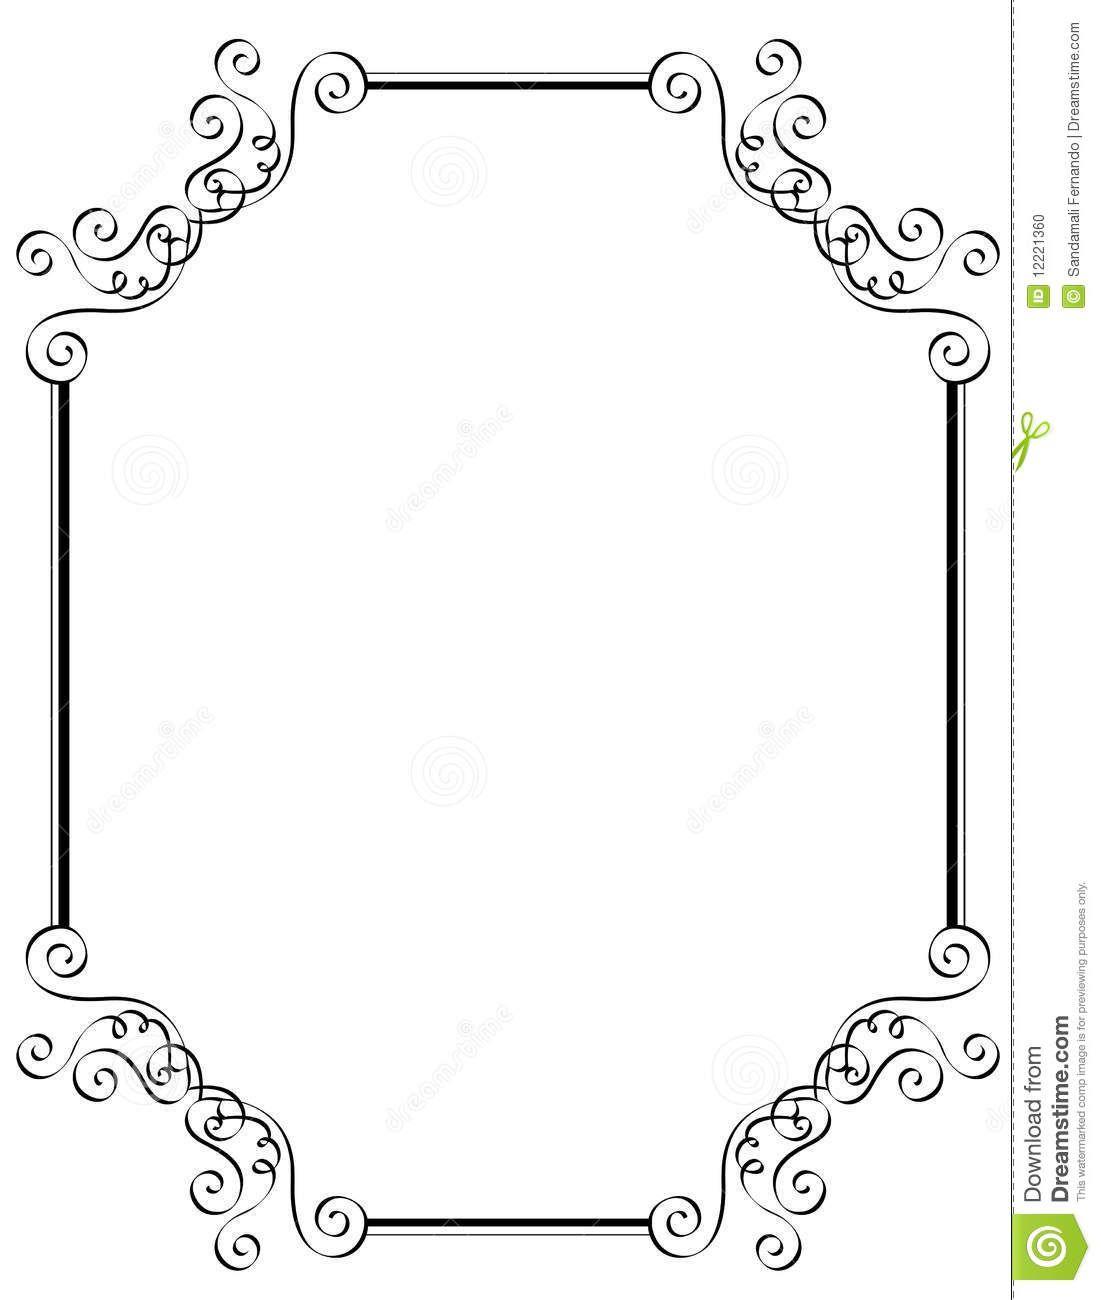 Free microsoft borders and frames wowcom image for Free printable disney wedding invitations templates